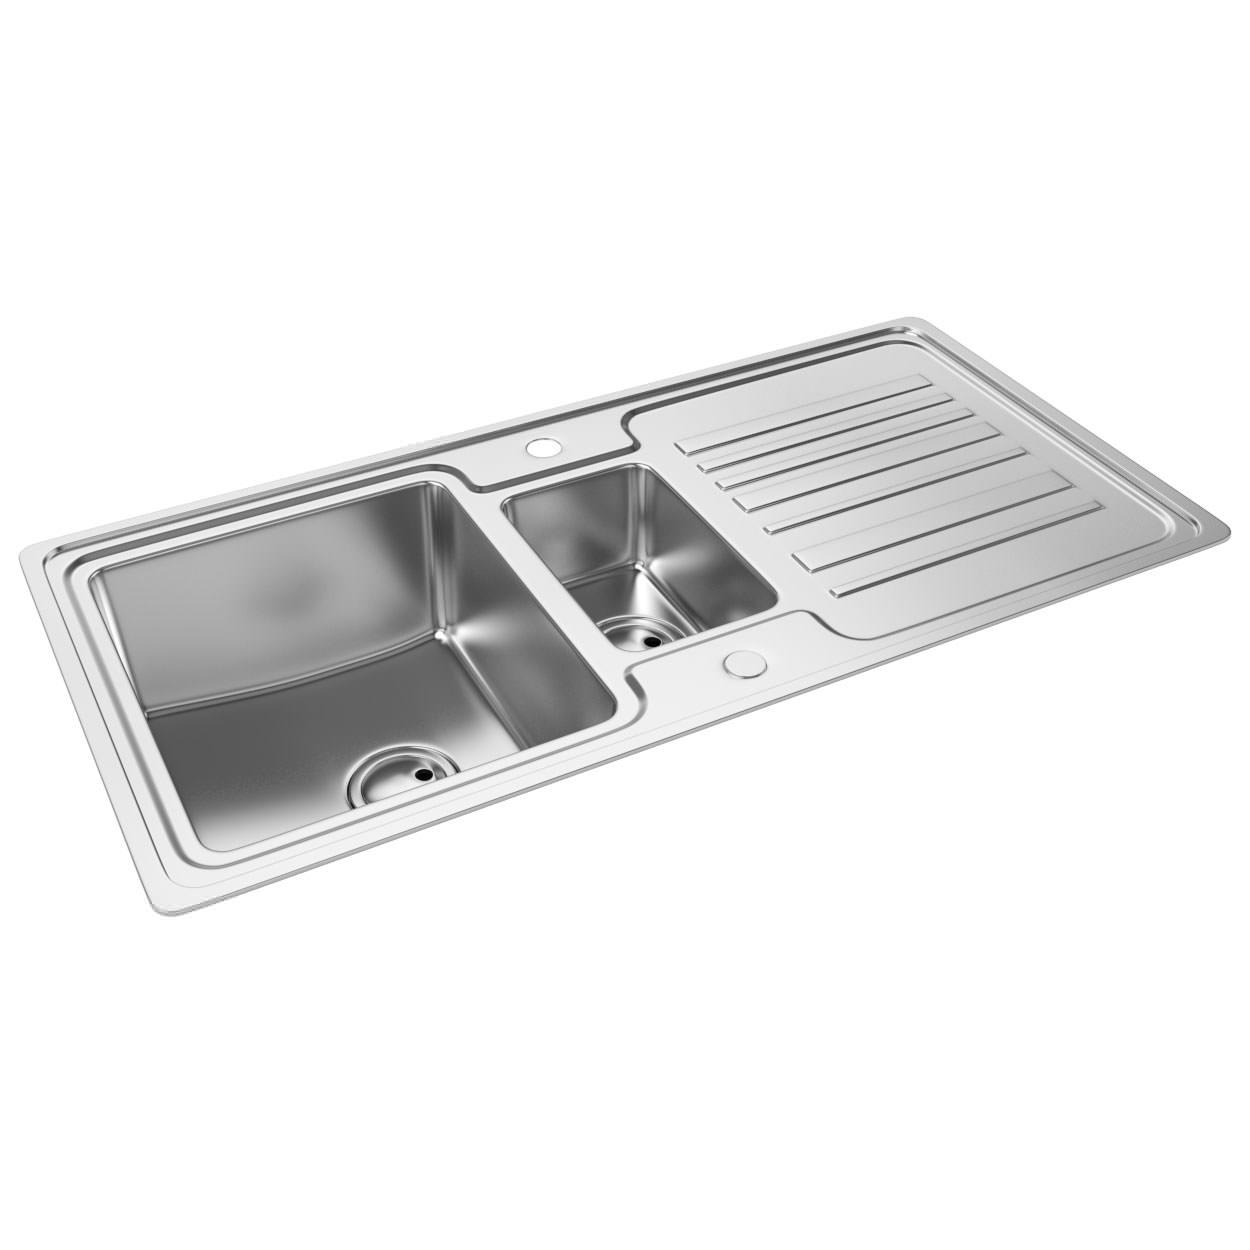 1.5 Bowl Kitchen Sink Abode apex 15 bowl reversible stainless steel kitchen sink abode apex 15 bowl reversible stainless steel kitchen sink and drainer workwithnaturefo